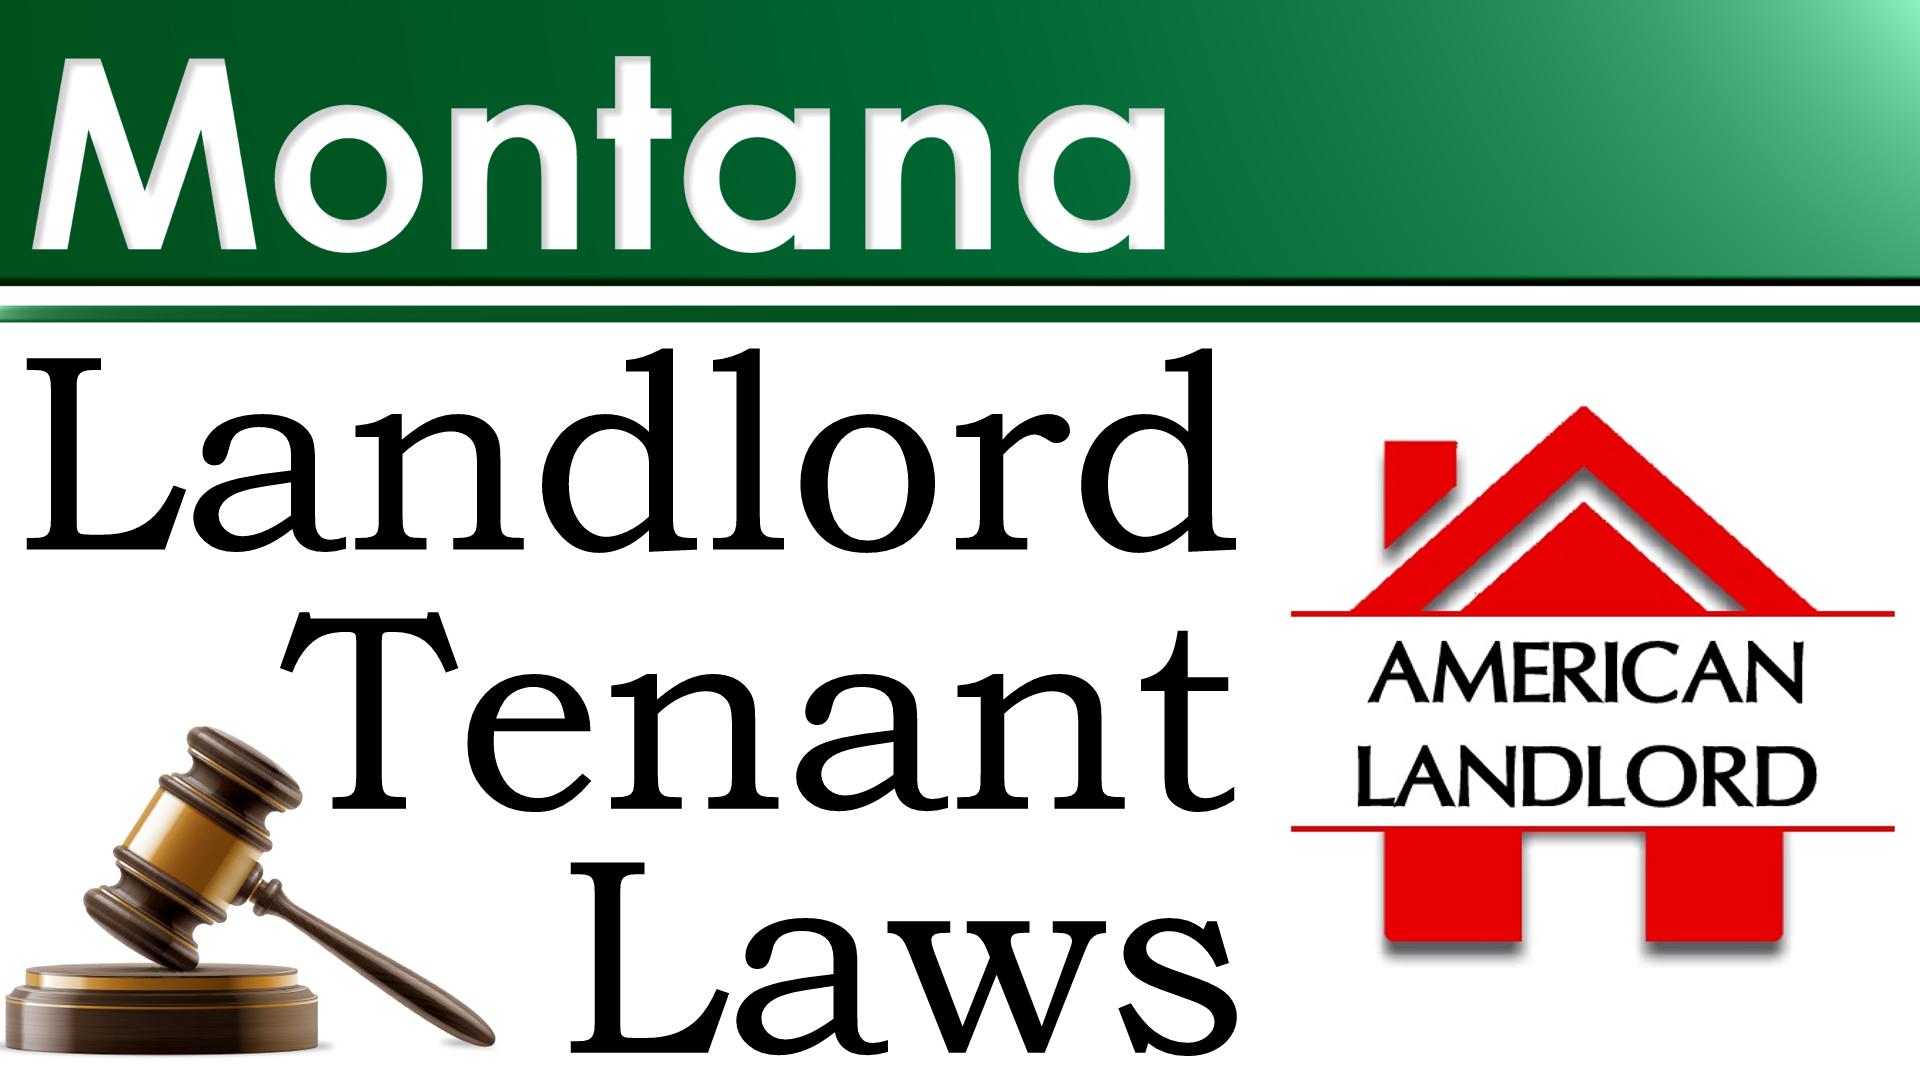 Montana landlord tenant law